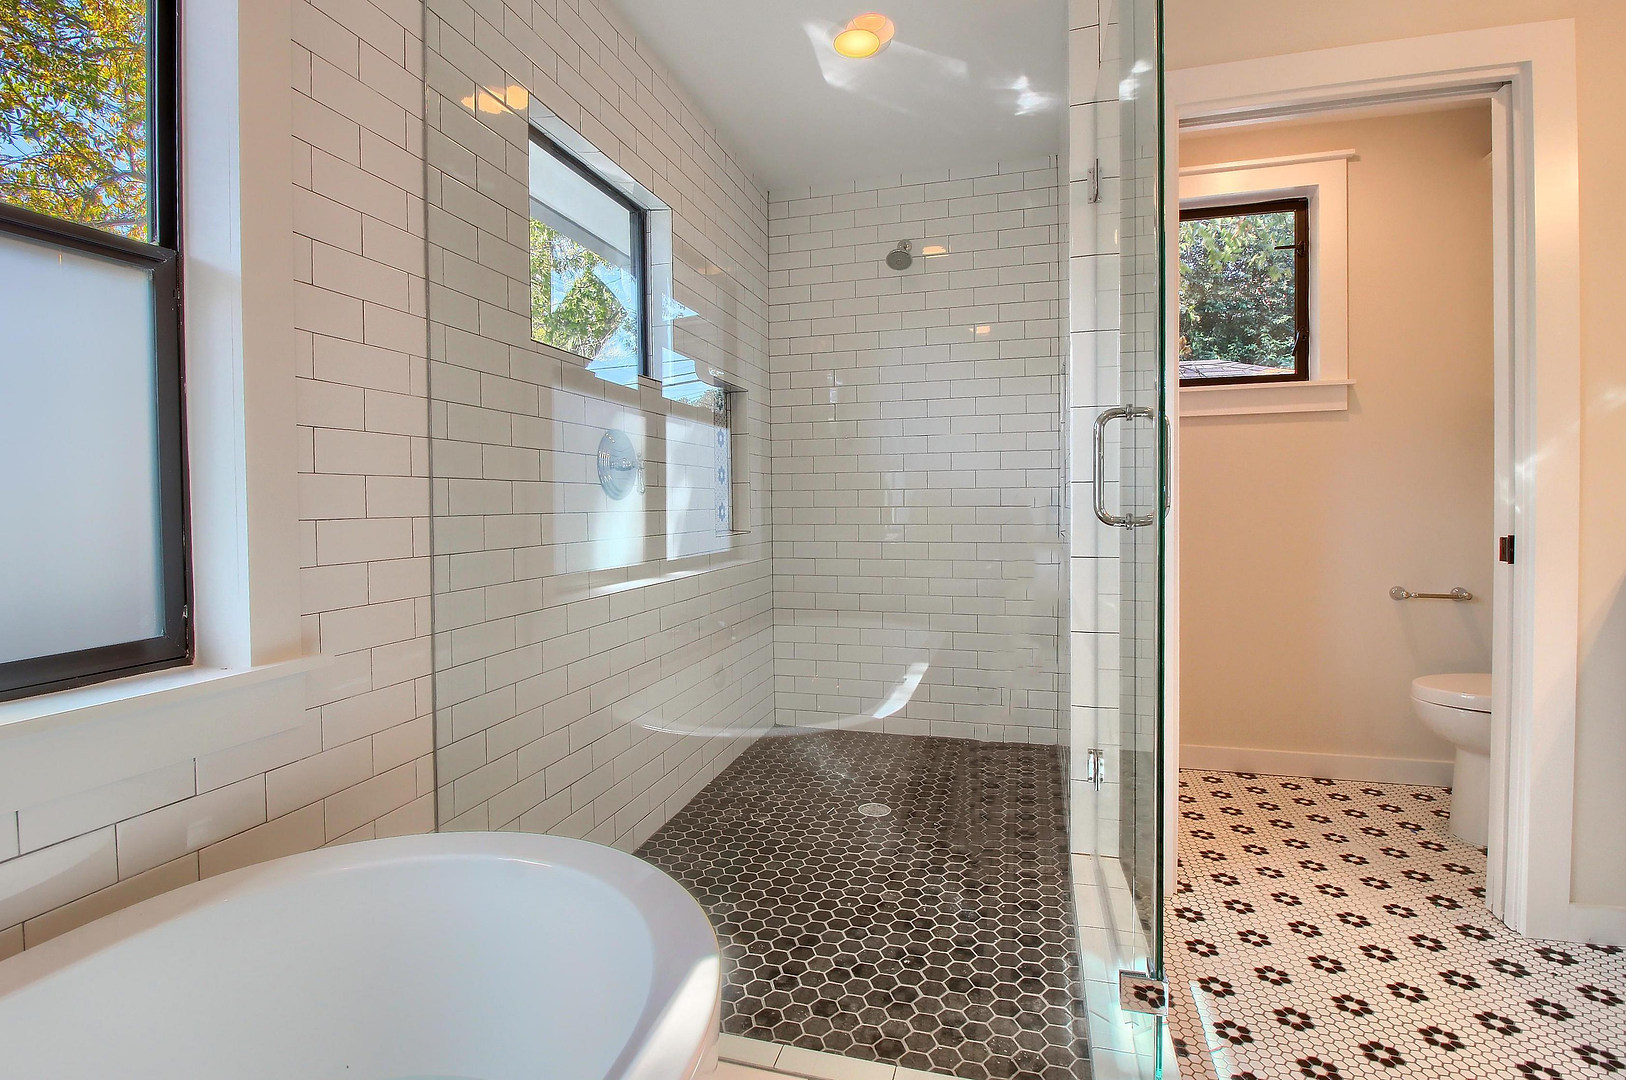 Home Renovation Master Bathroom on Bouldin in Austin, TX